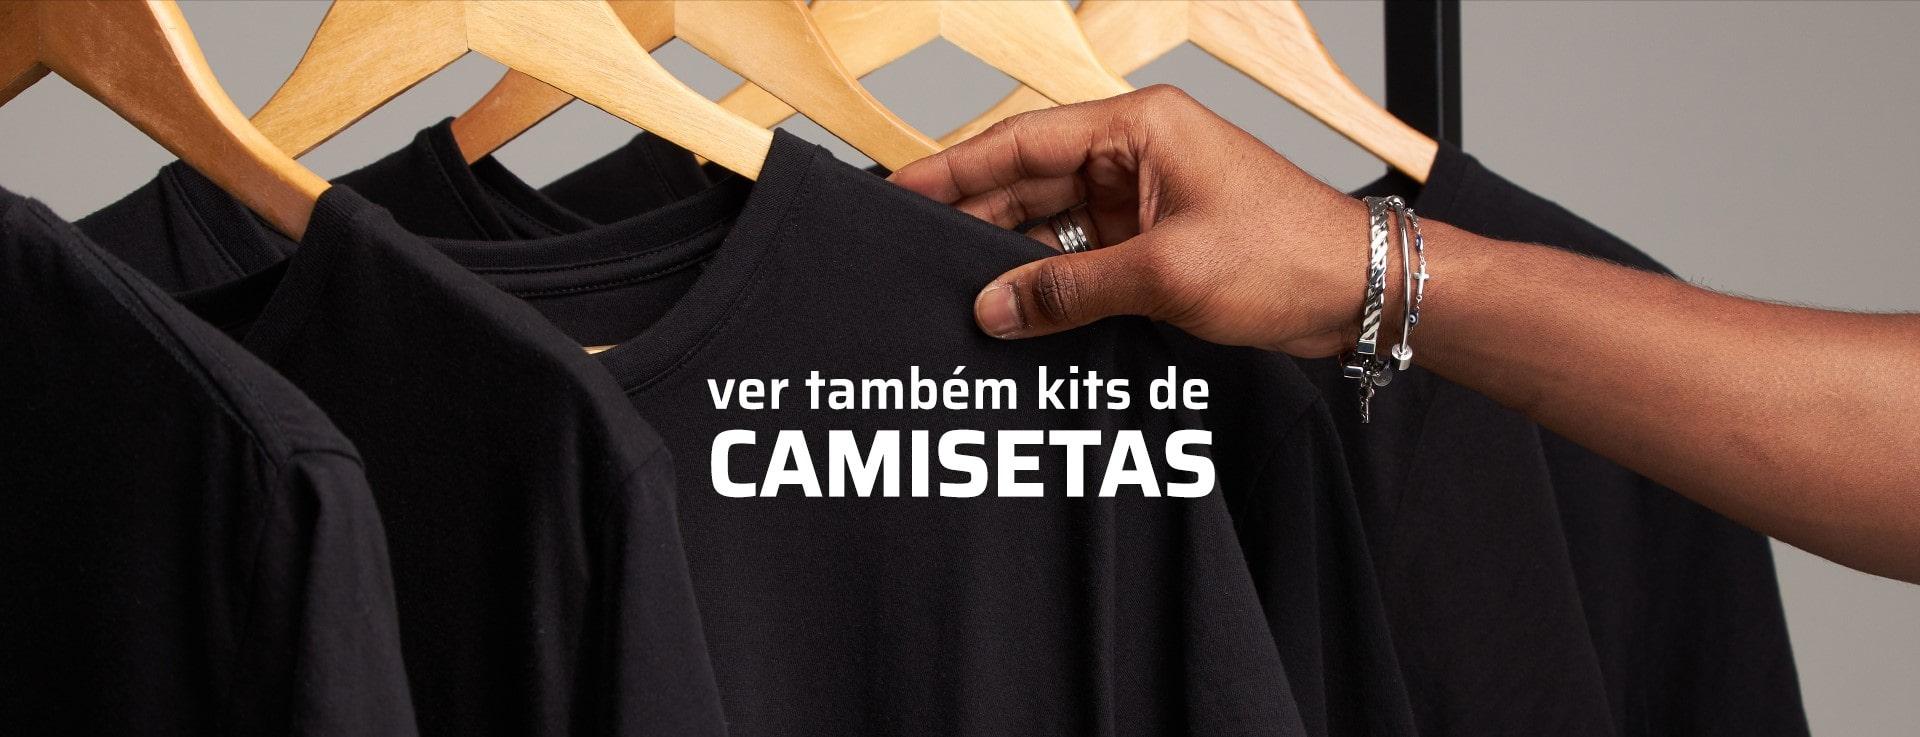 Kits Camisetas desk